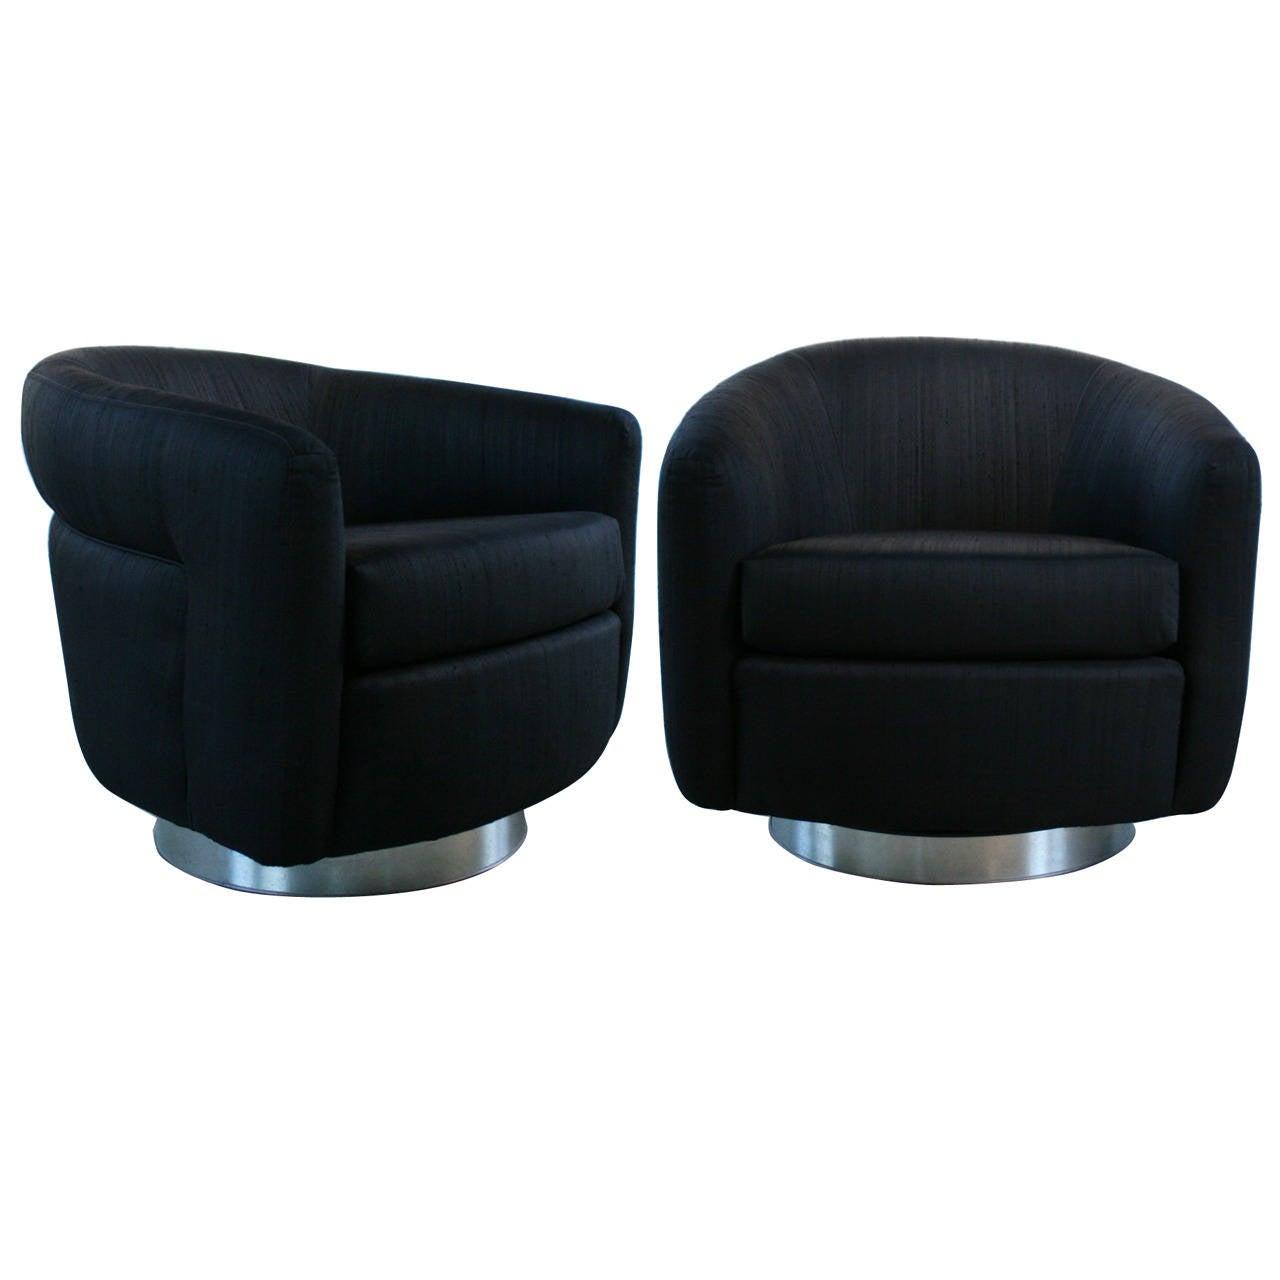 barrel chairs swivel rocker wheel chair in olx pair of milo baughman black and rocking